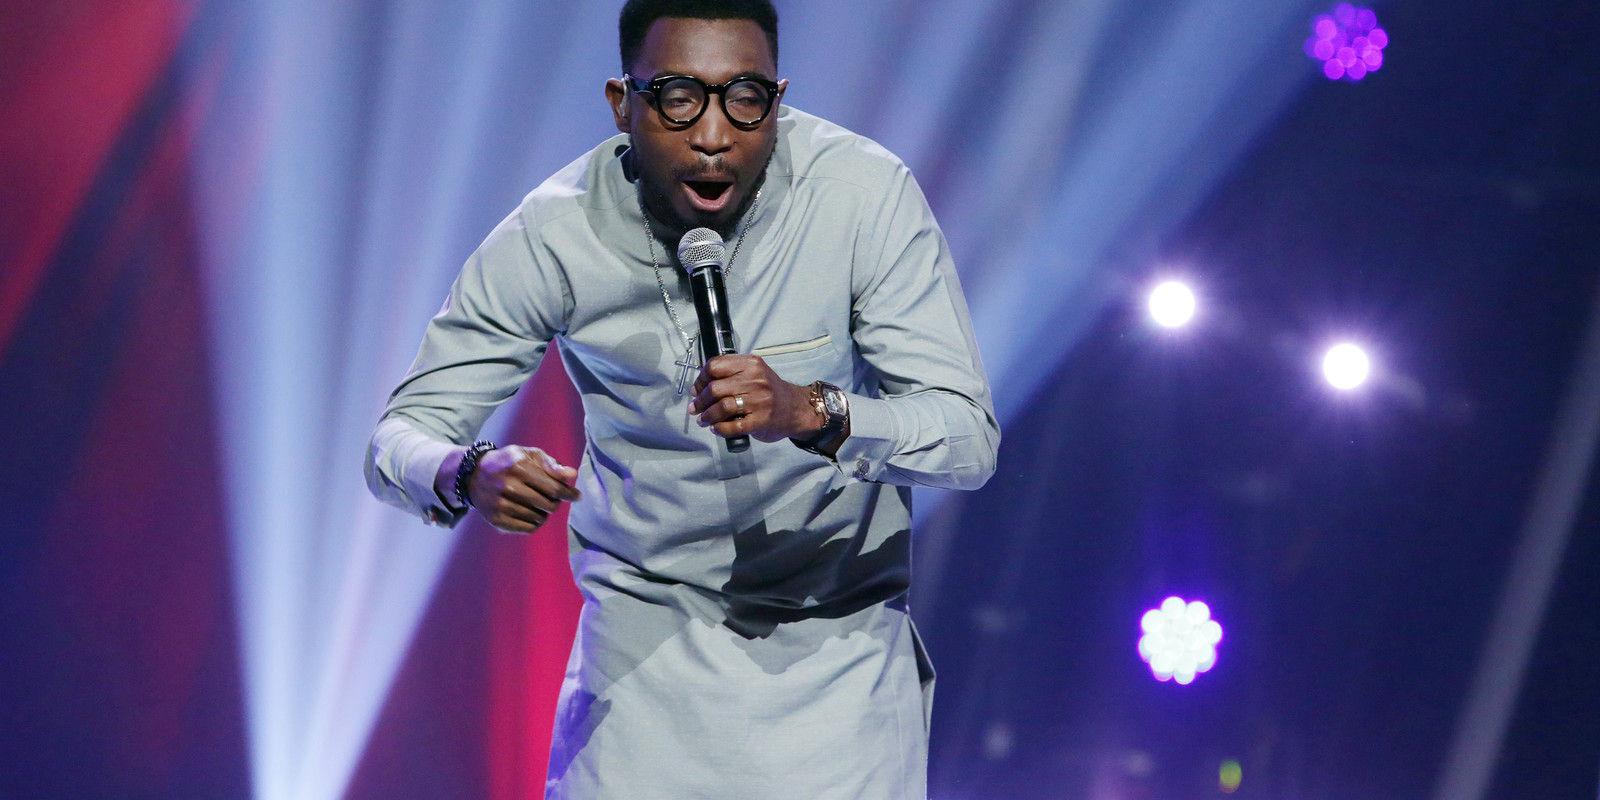 34 timi dakolo singing on stage  4  004 pre